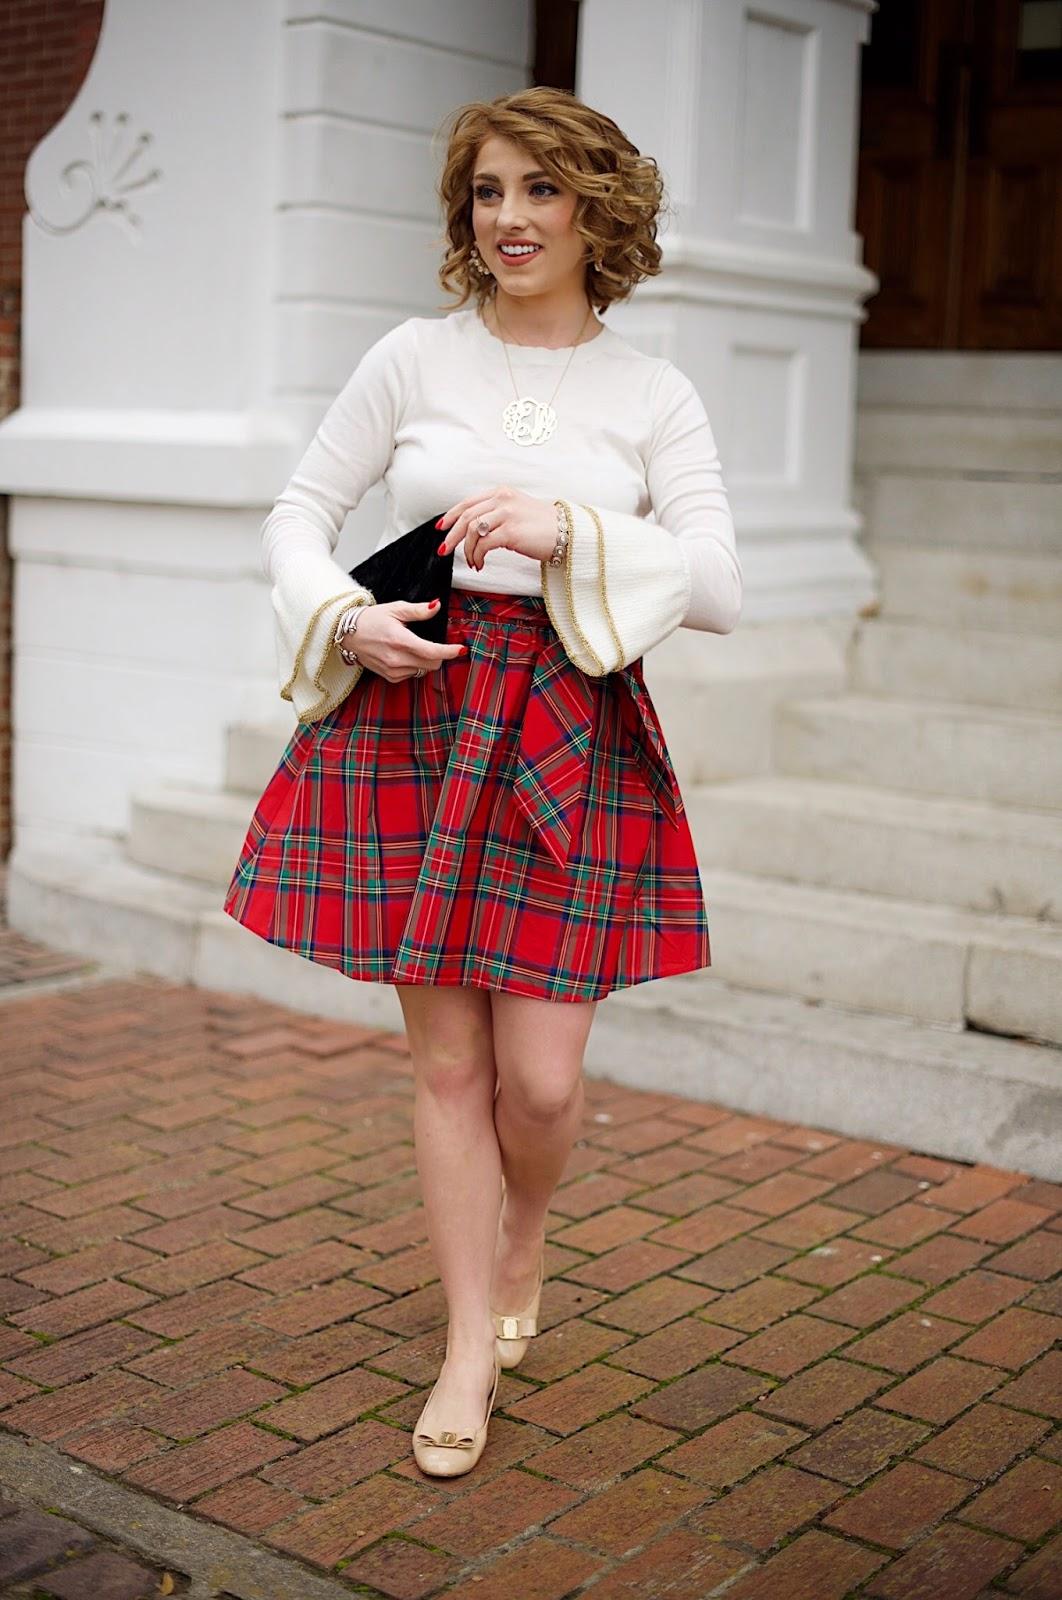 Vineyard Vines Jolly Plaid Party Skirt - Something Delightful Blog